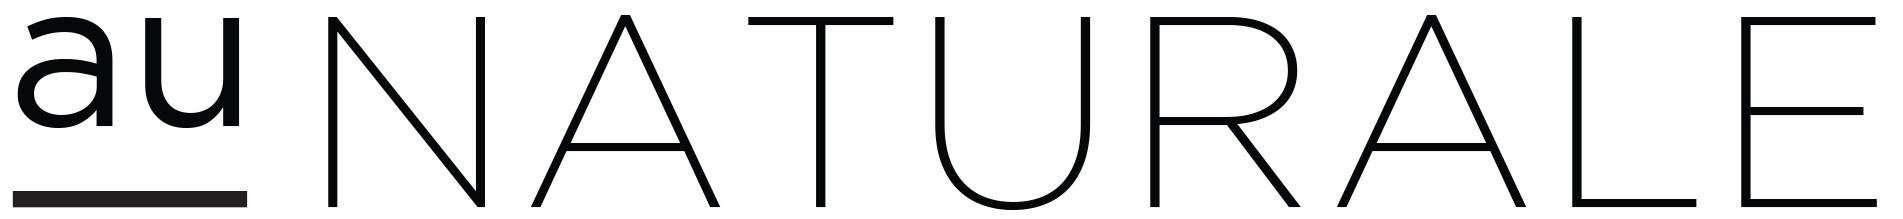 au-natural-logo.jpg